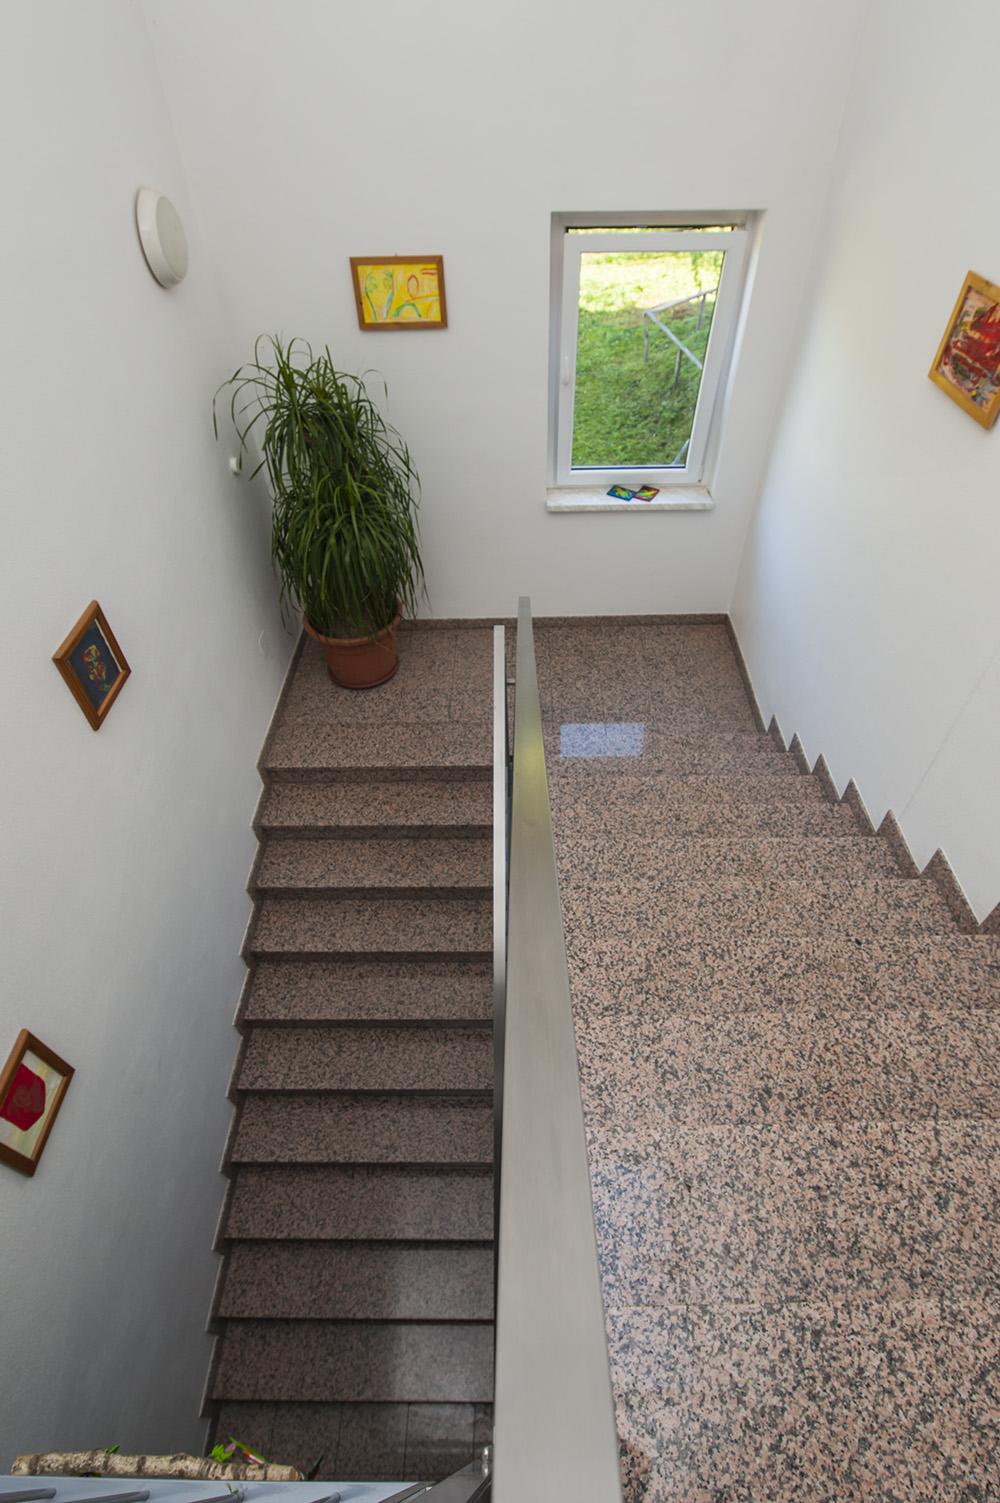 2. Fliesen Klagenfurt Land